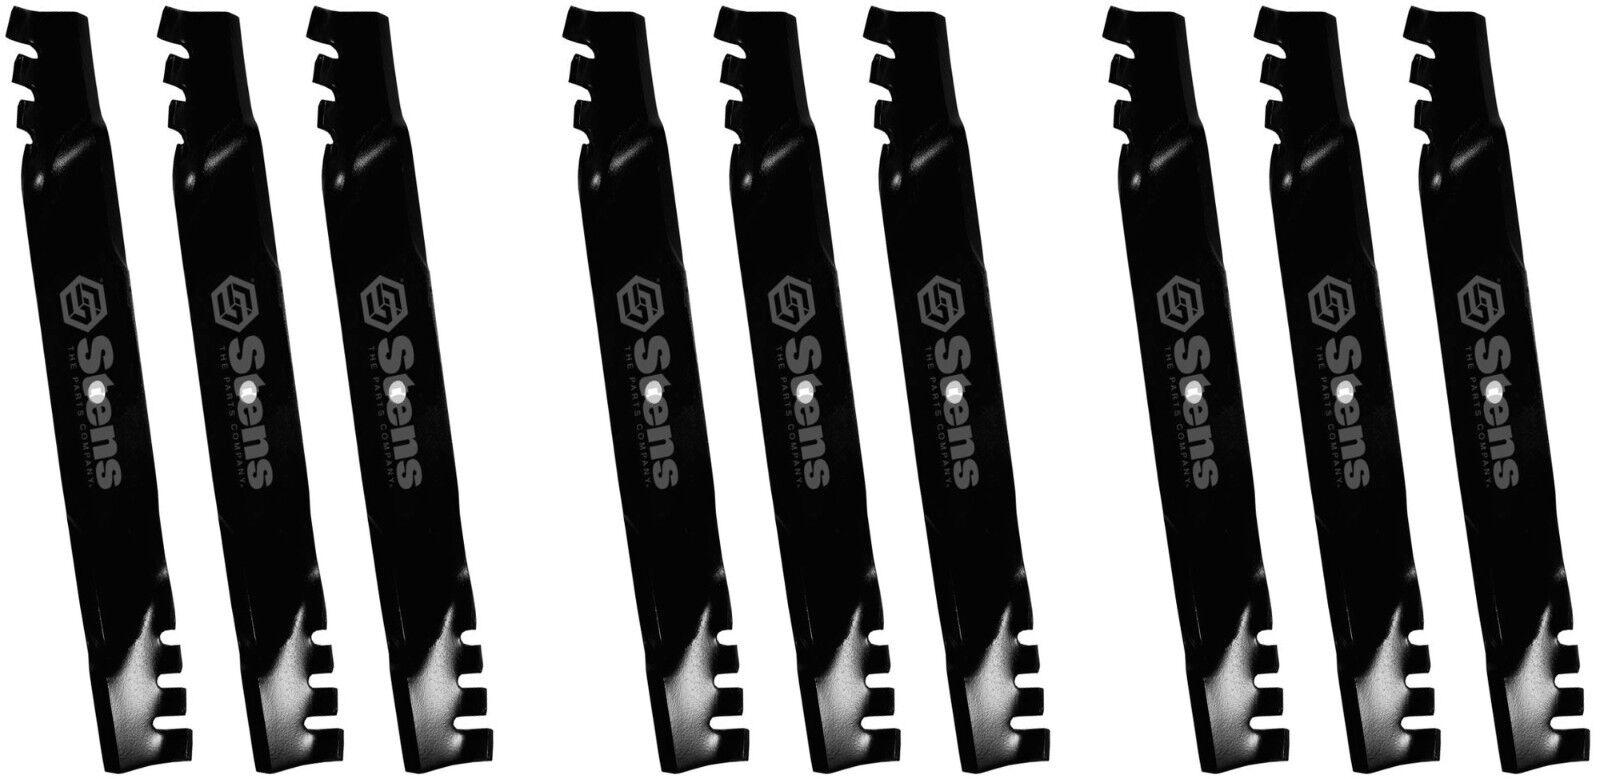 Stens 302-244 Grasshopper 320238 Silver Streak Toothed Blade for sale online